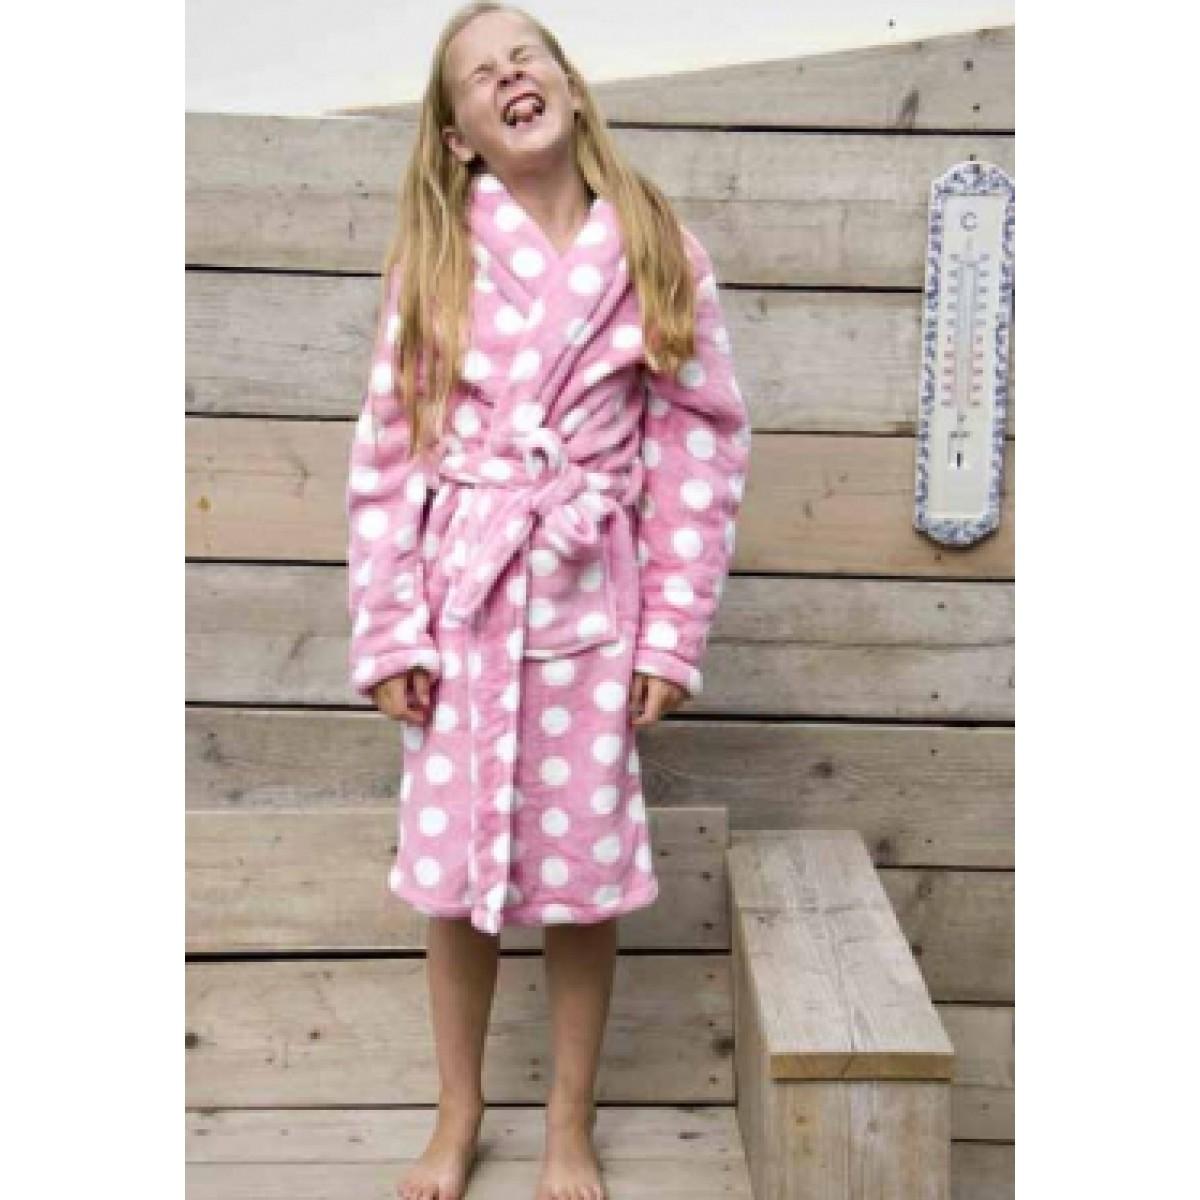 online kinderbadjassen